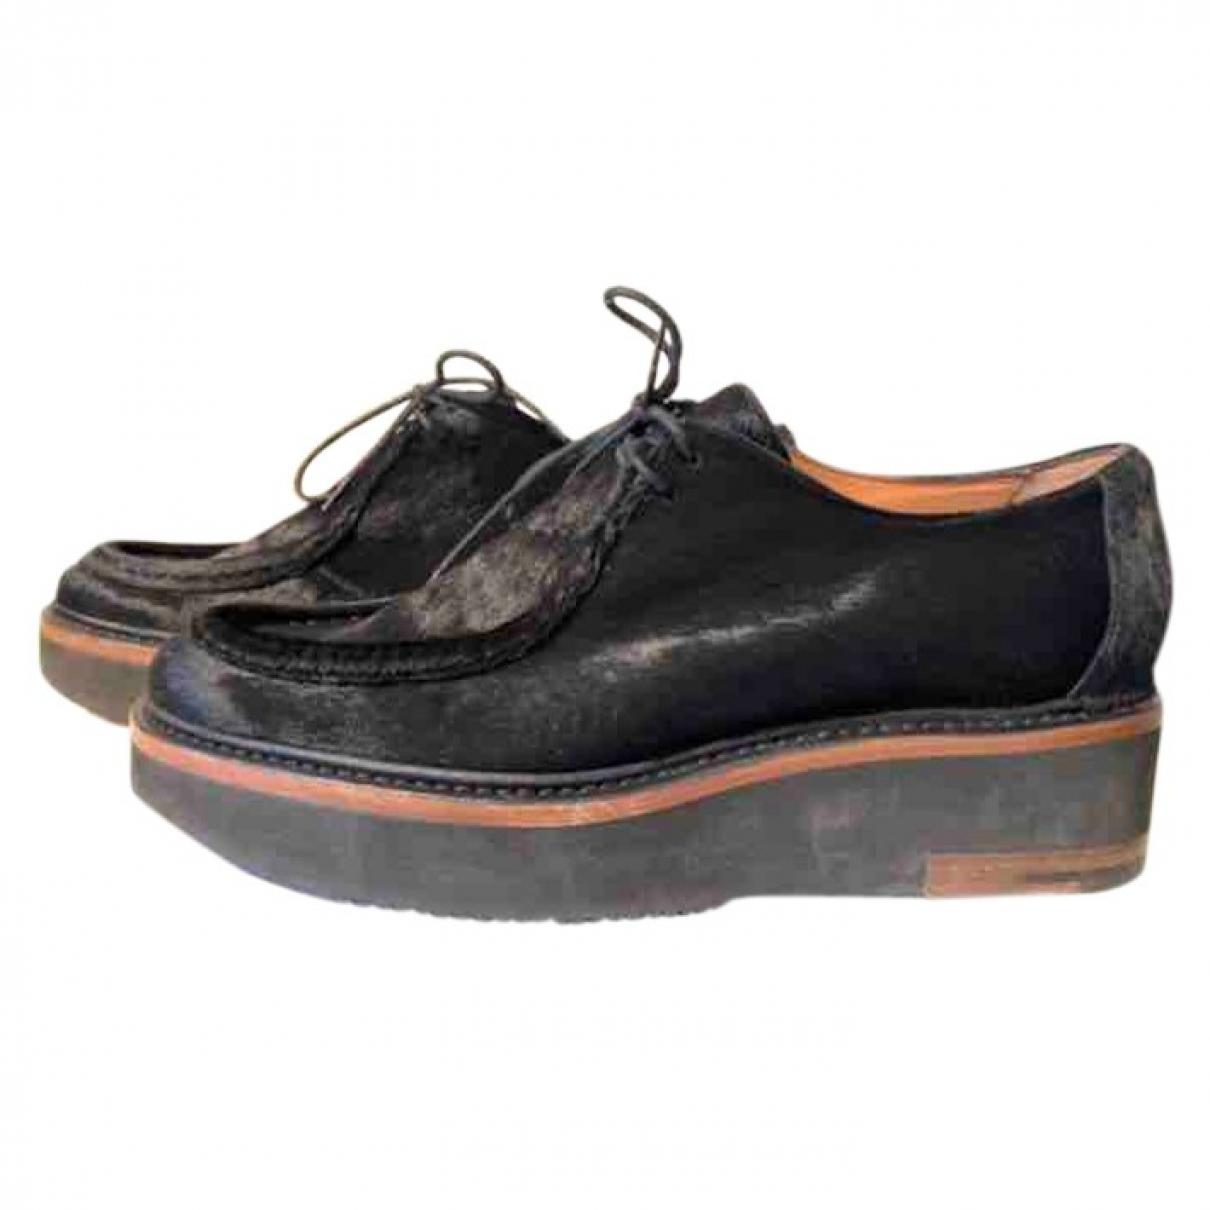 Dries Van Noten - Derbies   pour femme en cuir - noir